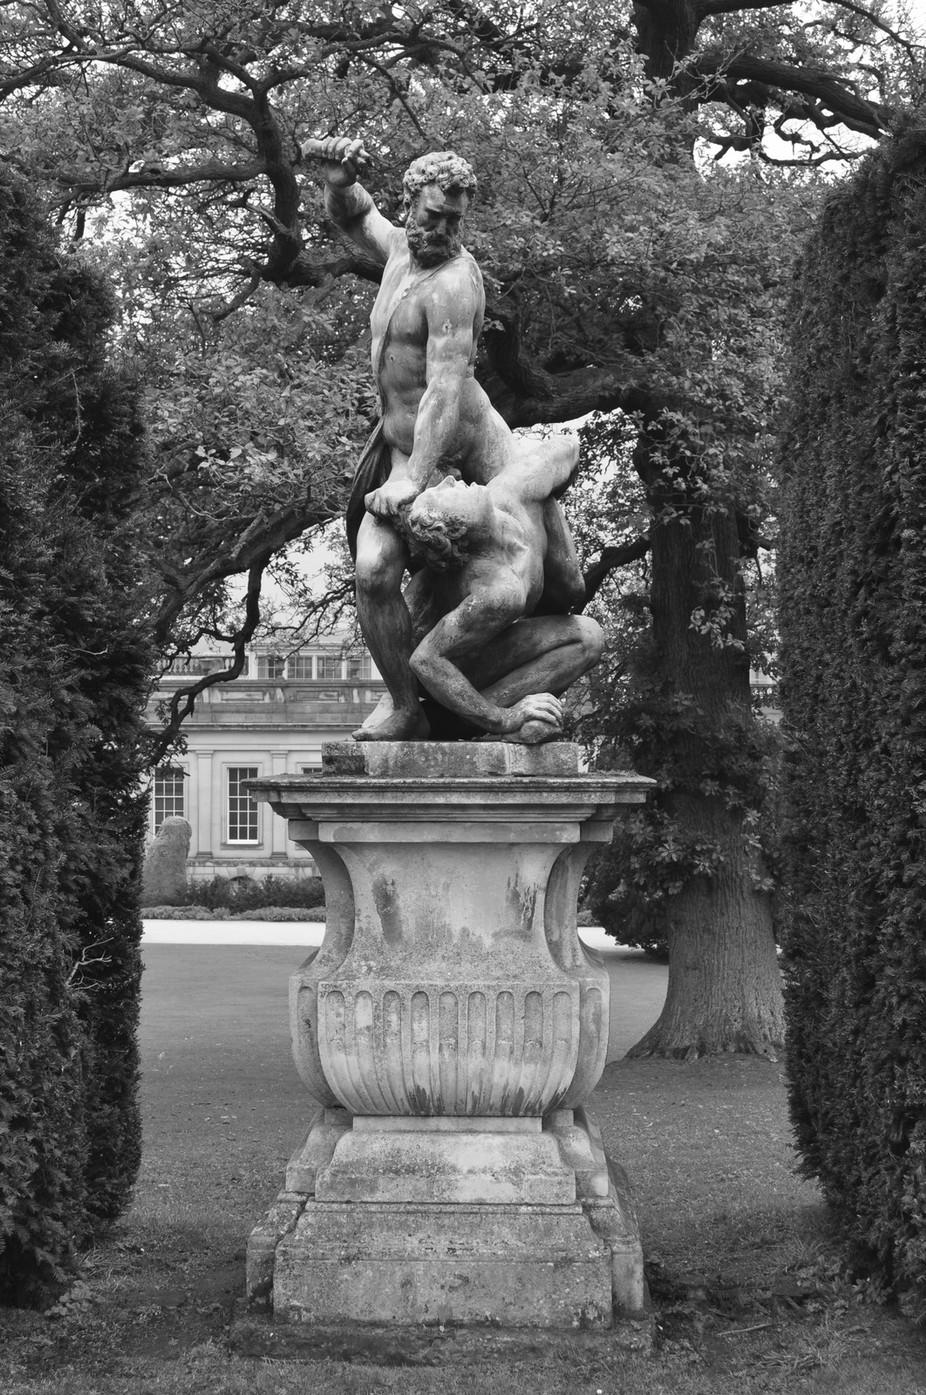 Chatsworth House statuary is the stuff of Greek Legends